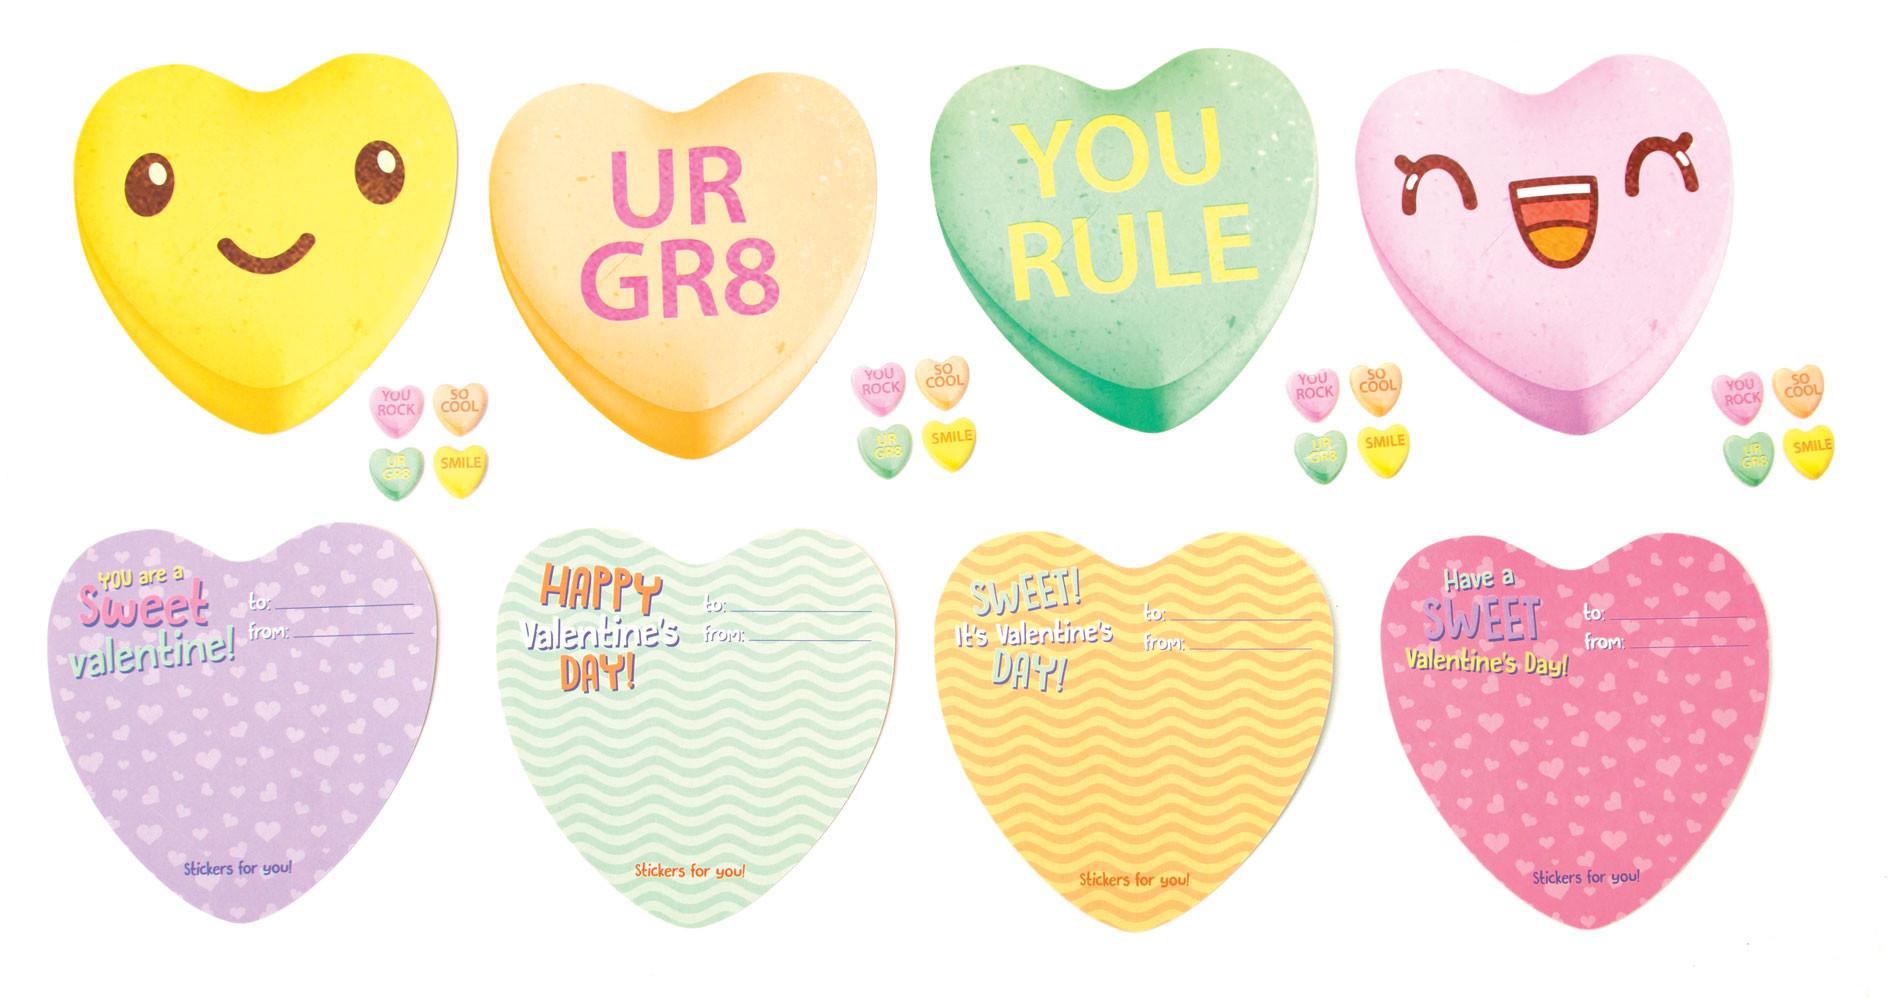 Valentine Cards VPL-7007 cards1.jpg